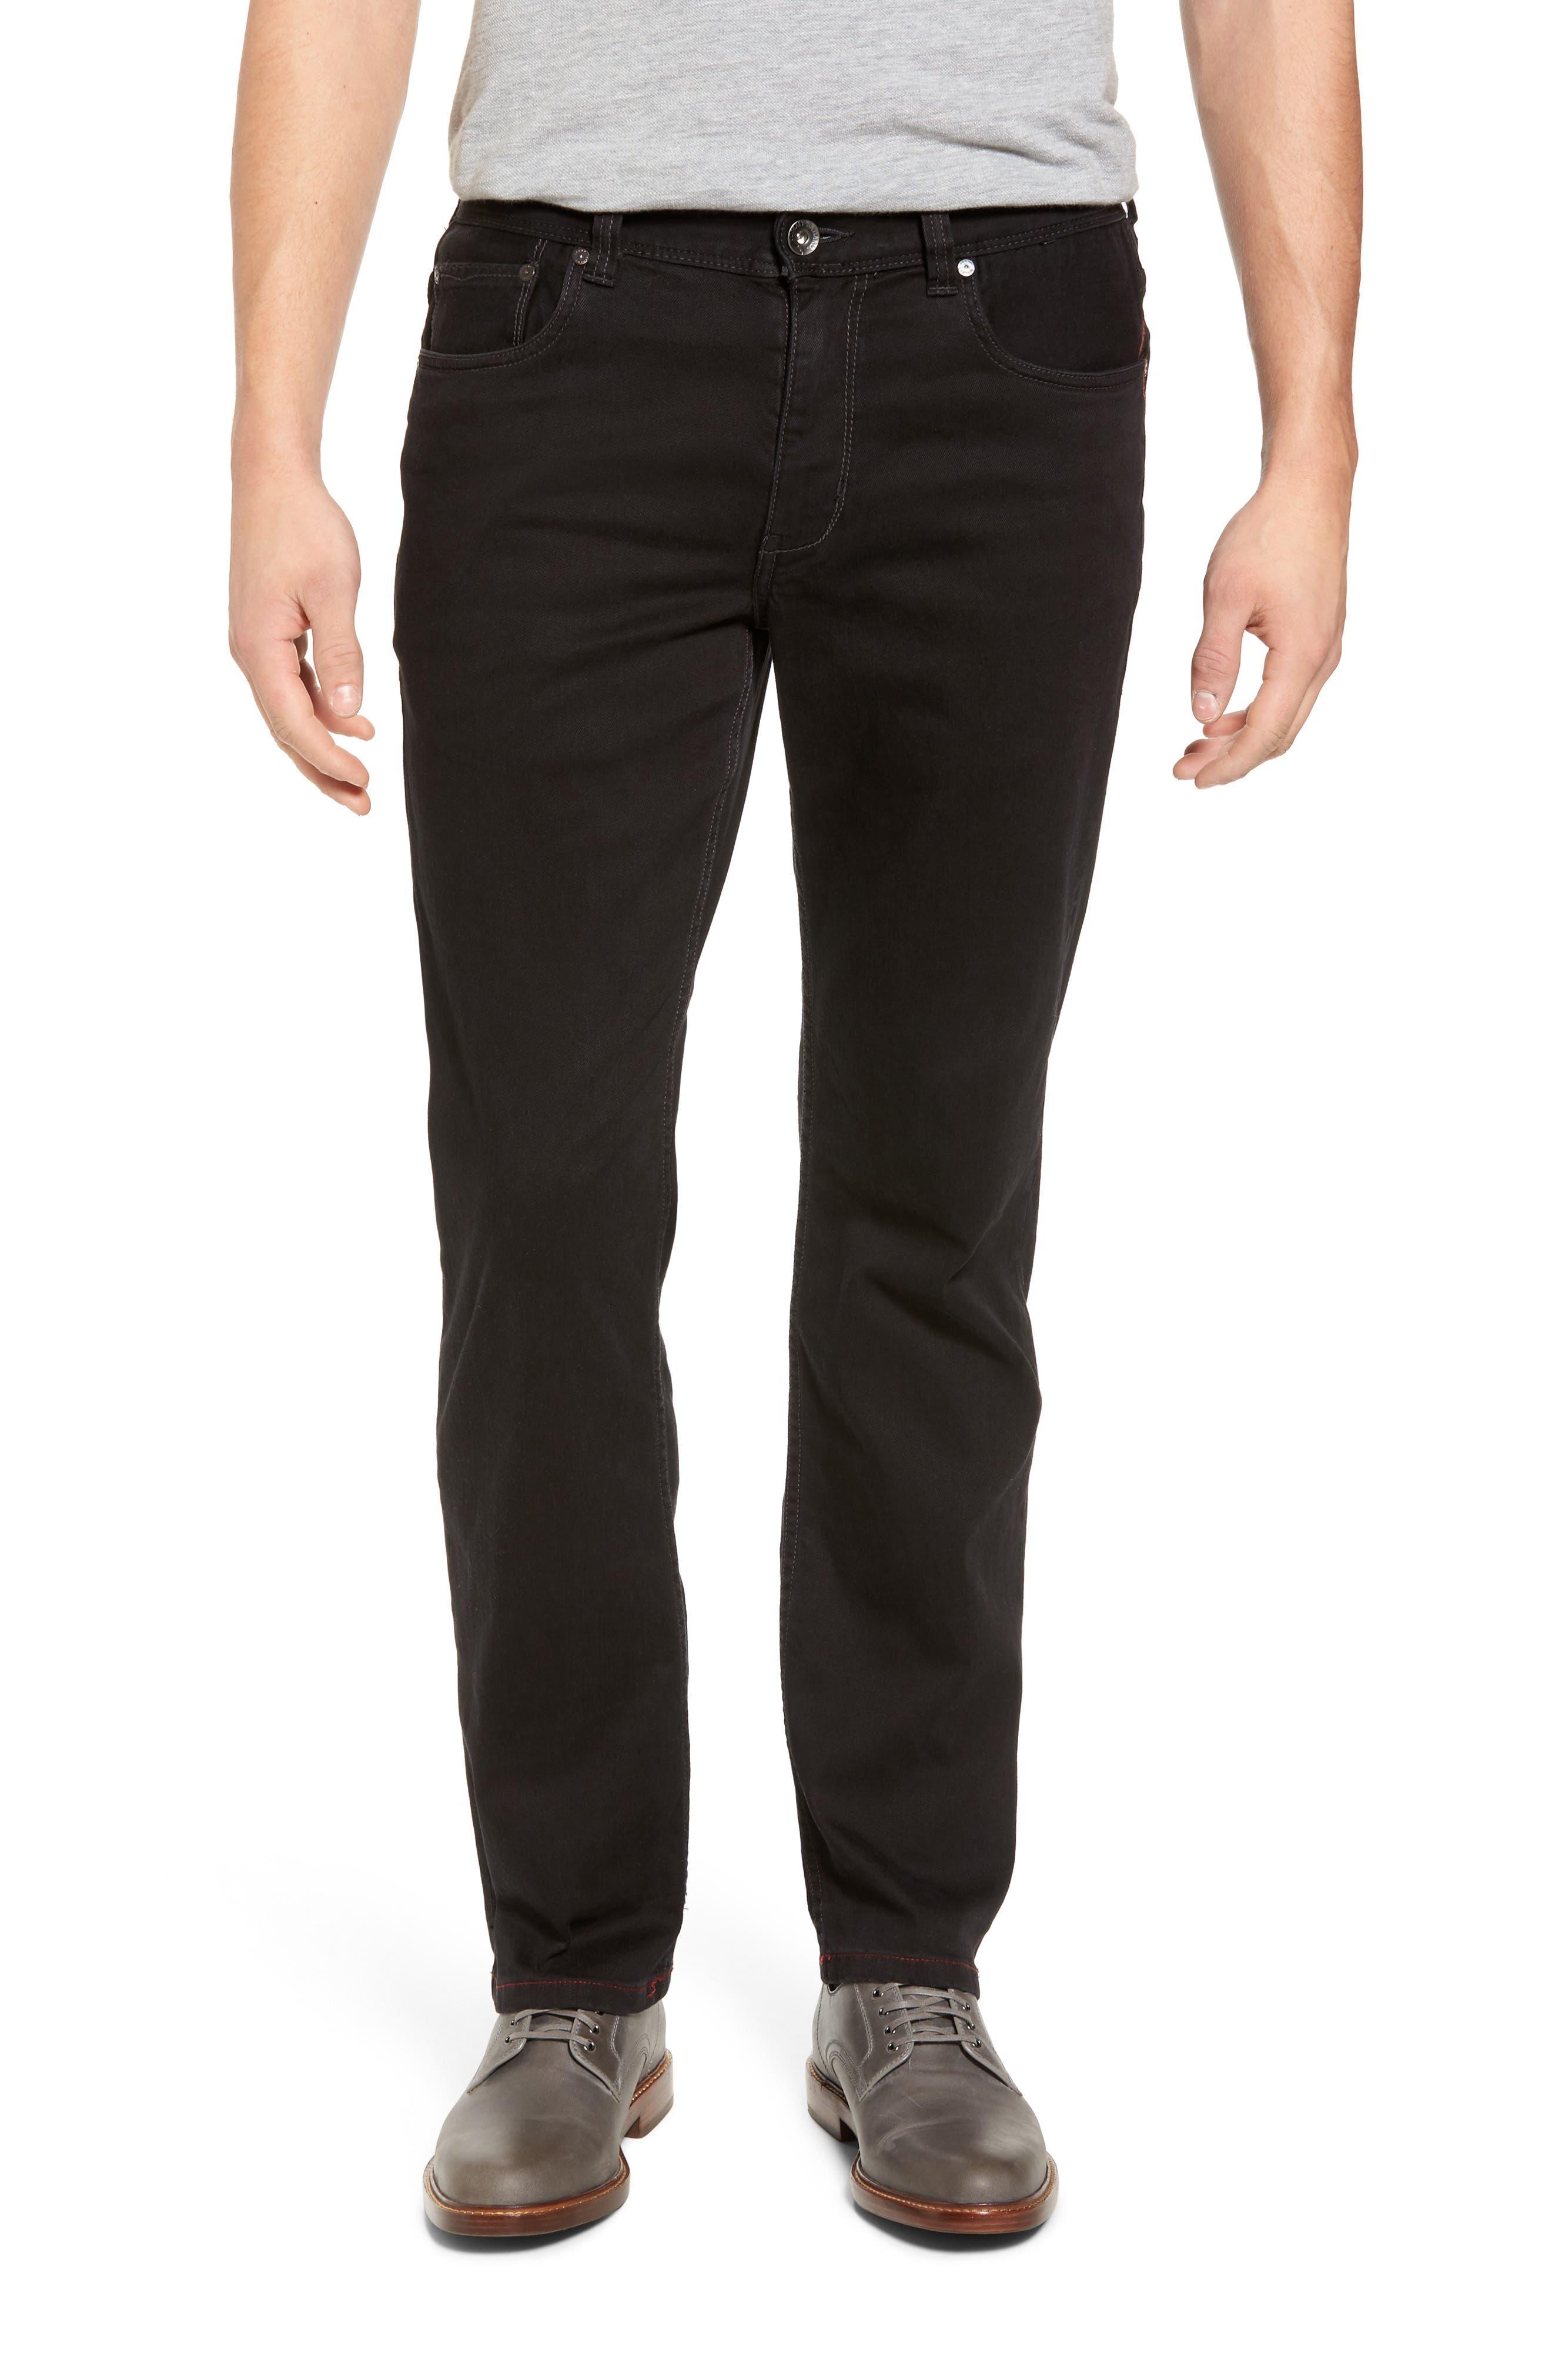 Sand Straight Leg Jeans,                             Main thumbnail 1, color,                             BLACK OVERDYE